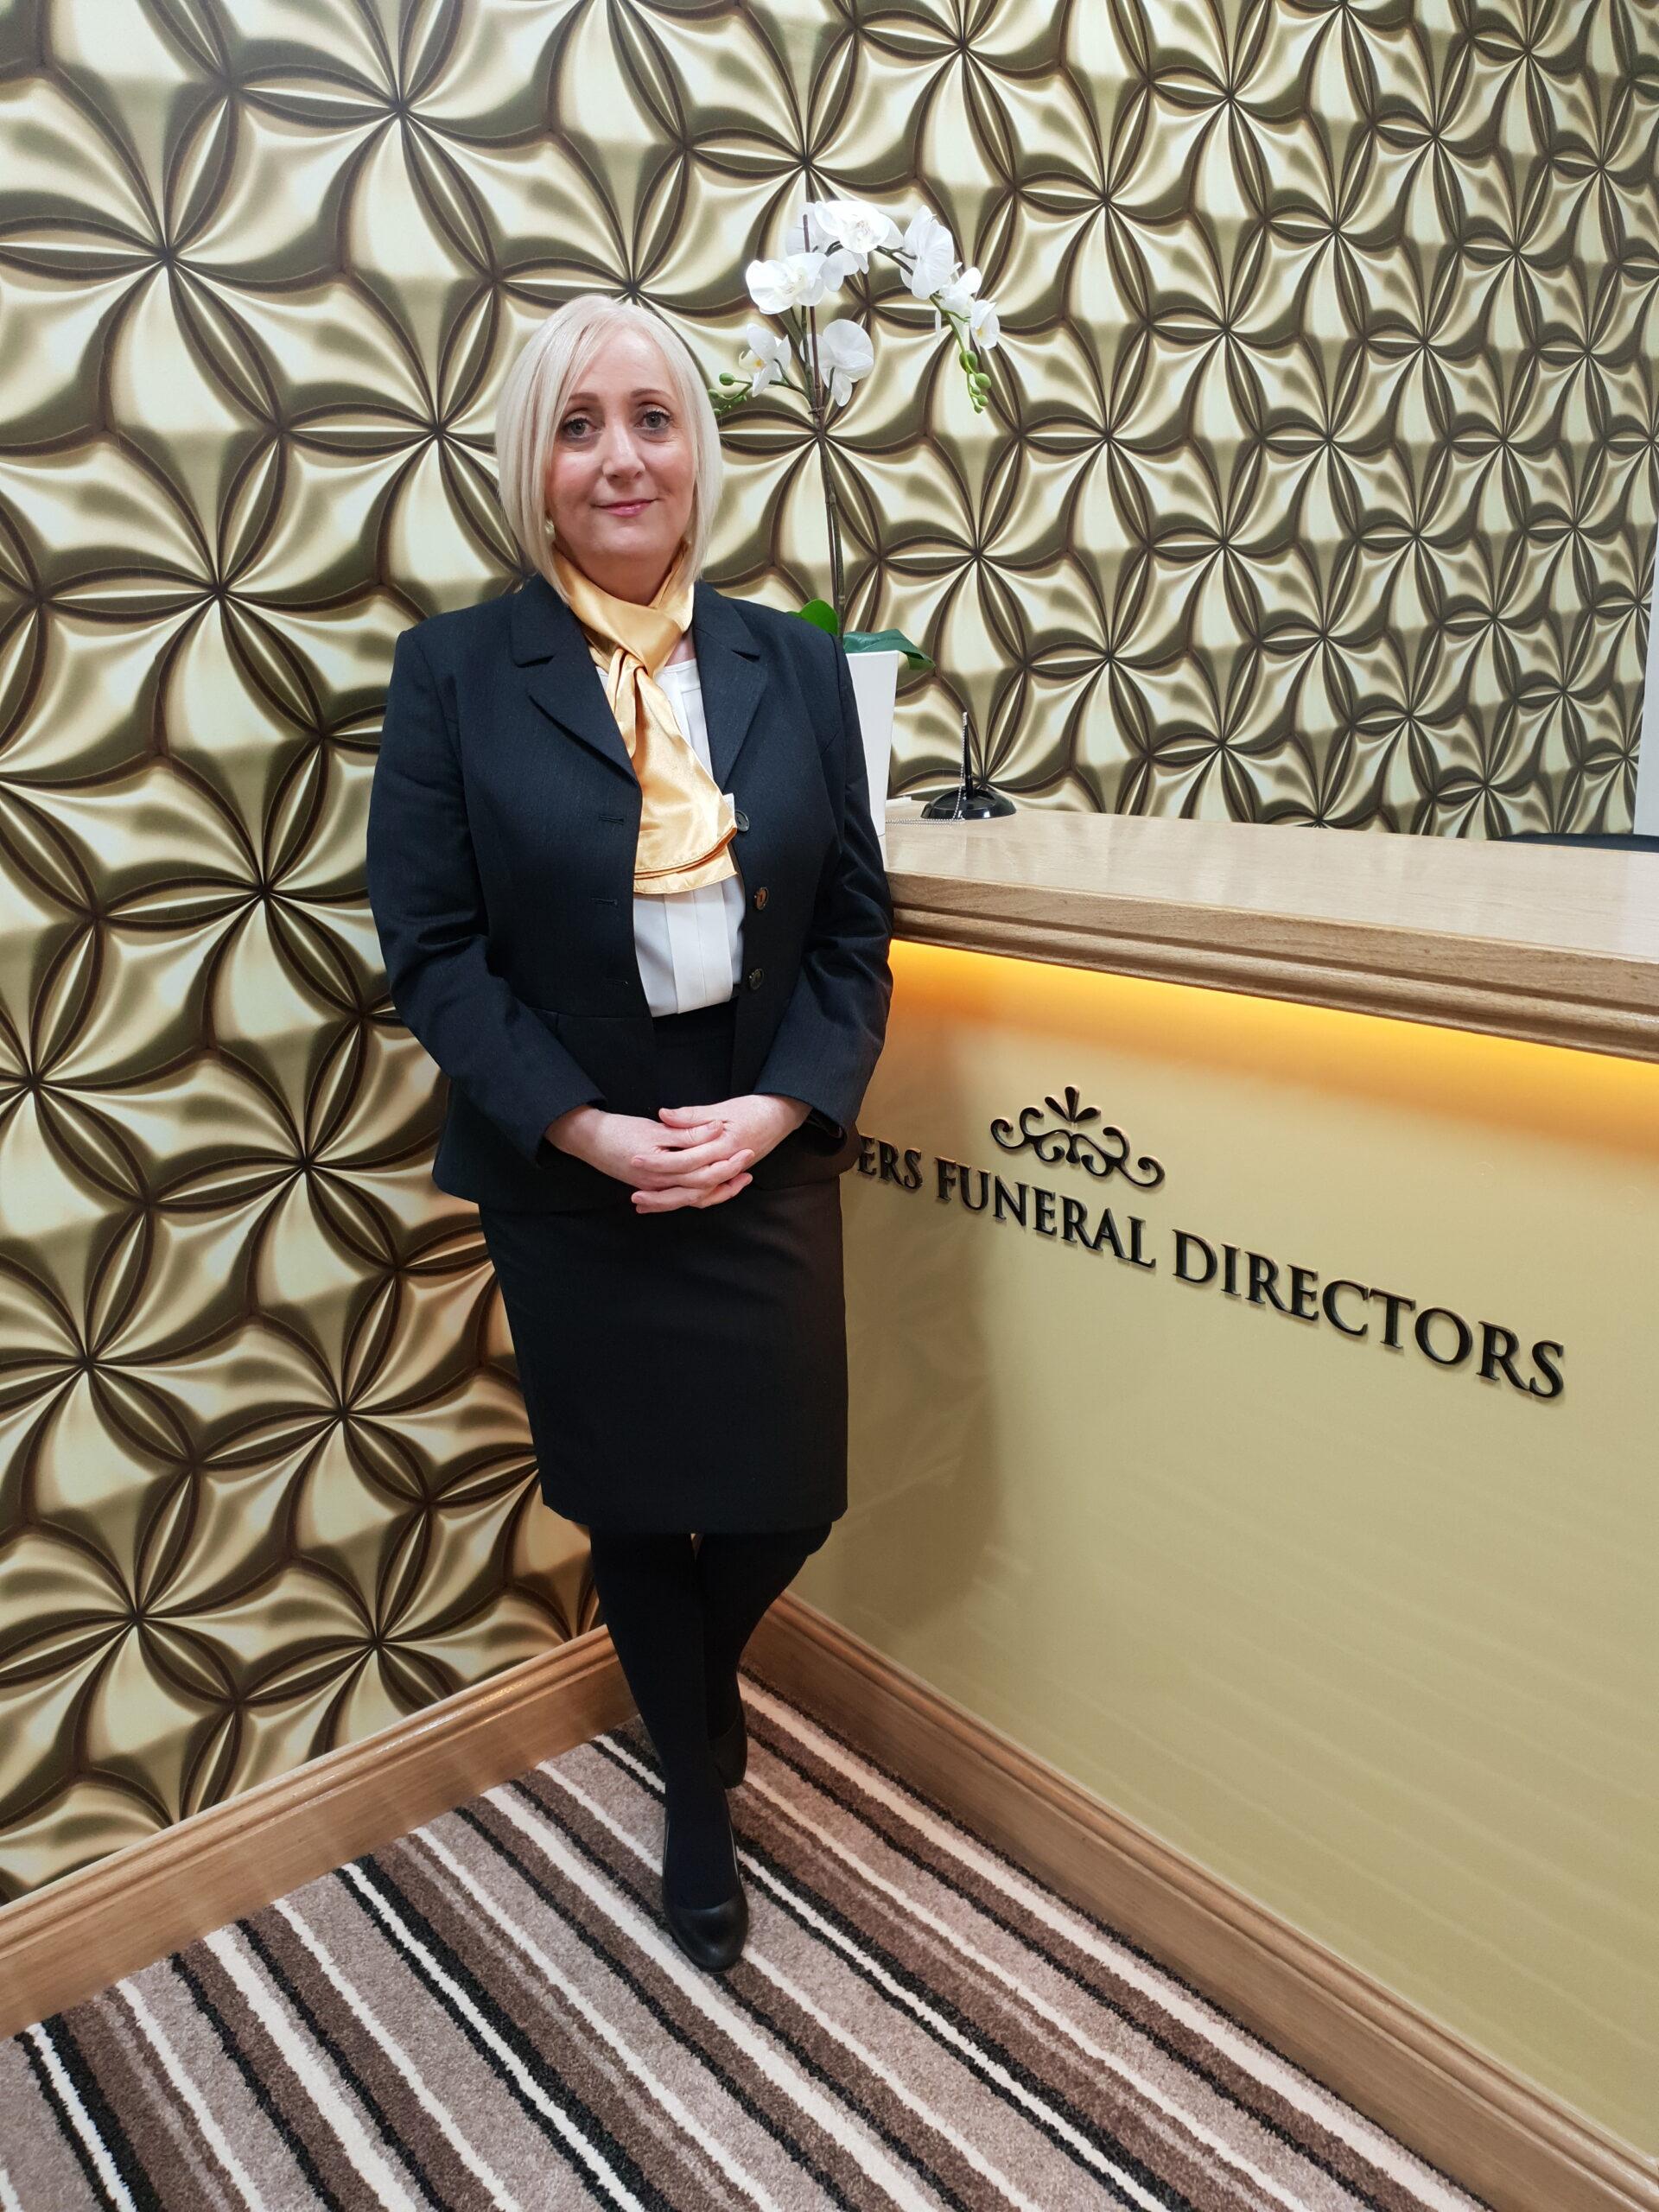 Yvonne Cumbernauld Funeral Directors